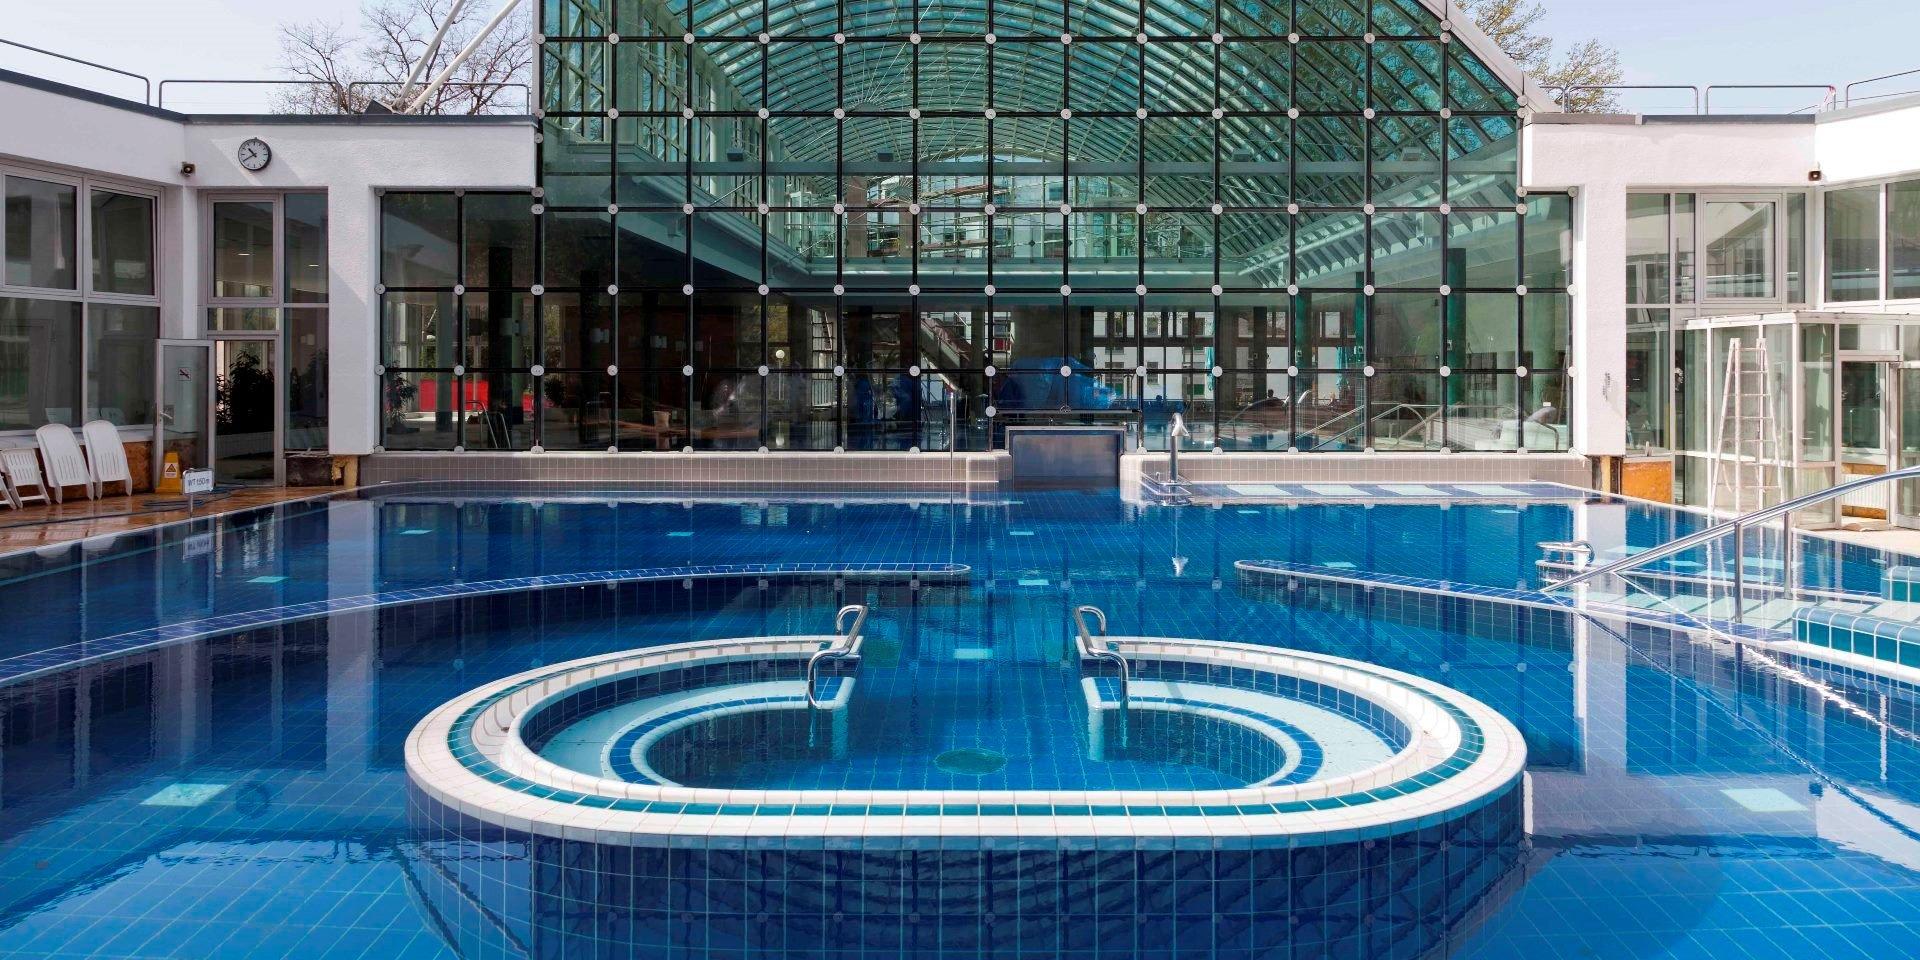 stuttgart mineralbad cannstatt steuler schwimmbadbau. Black Bedroom Furniture Sets. Home Design Ideas